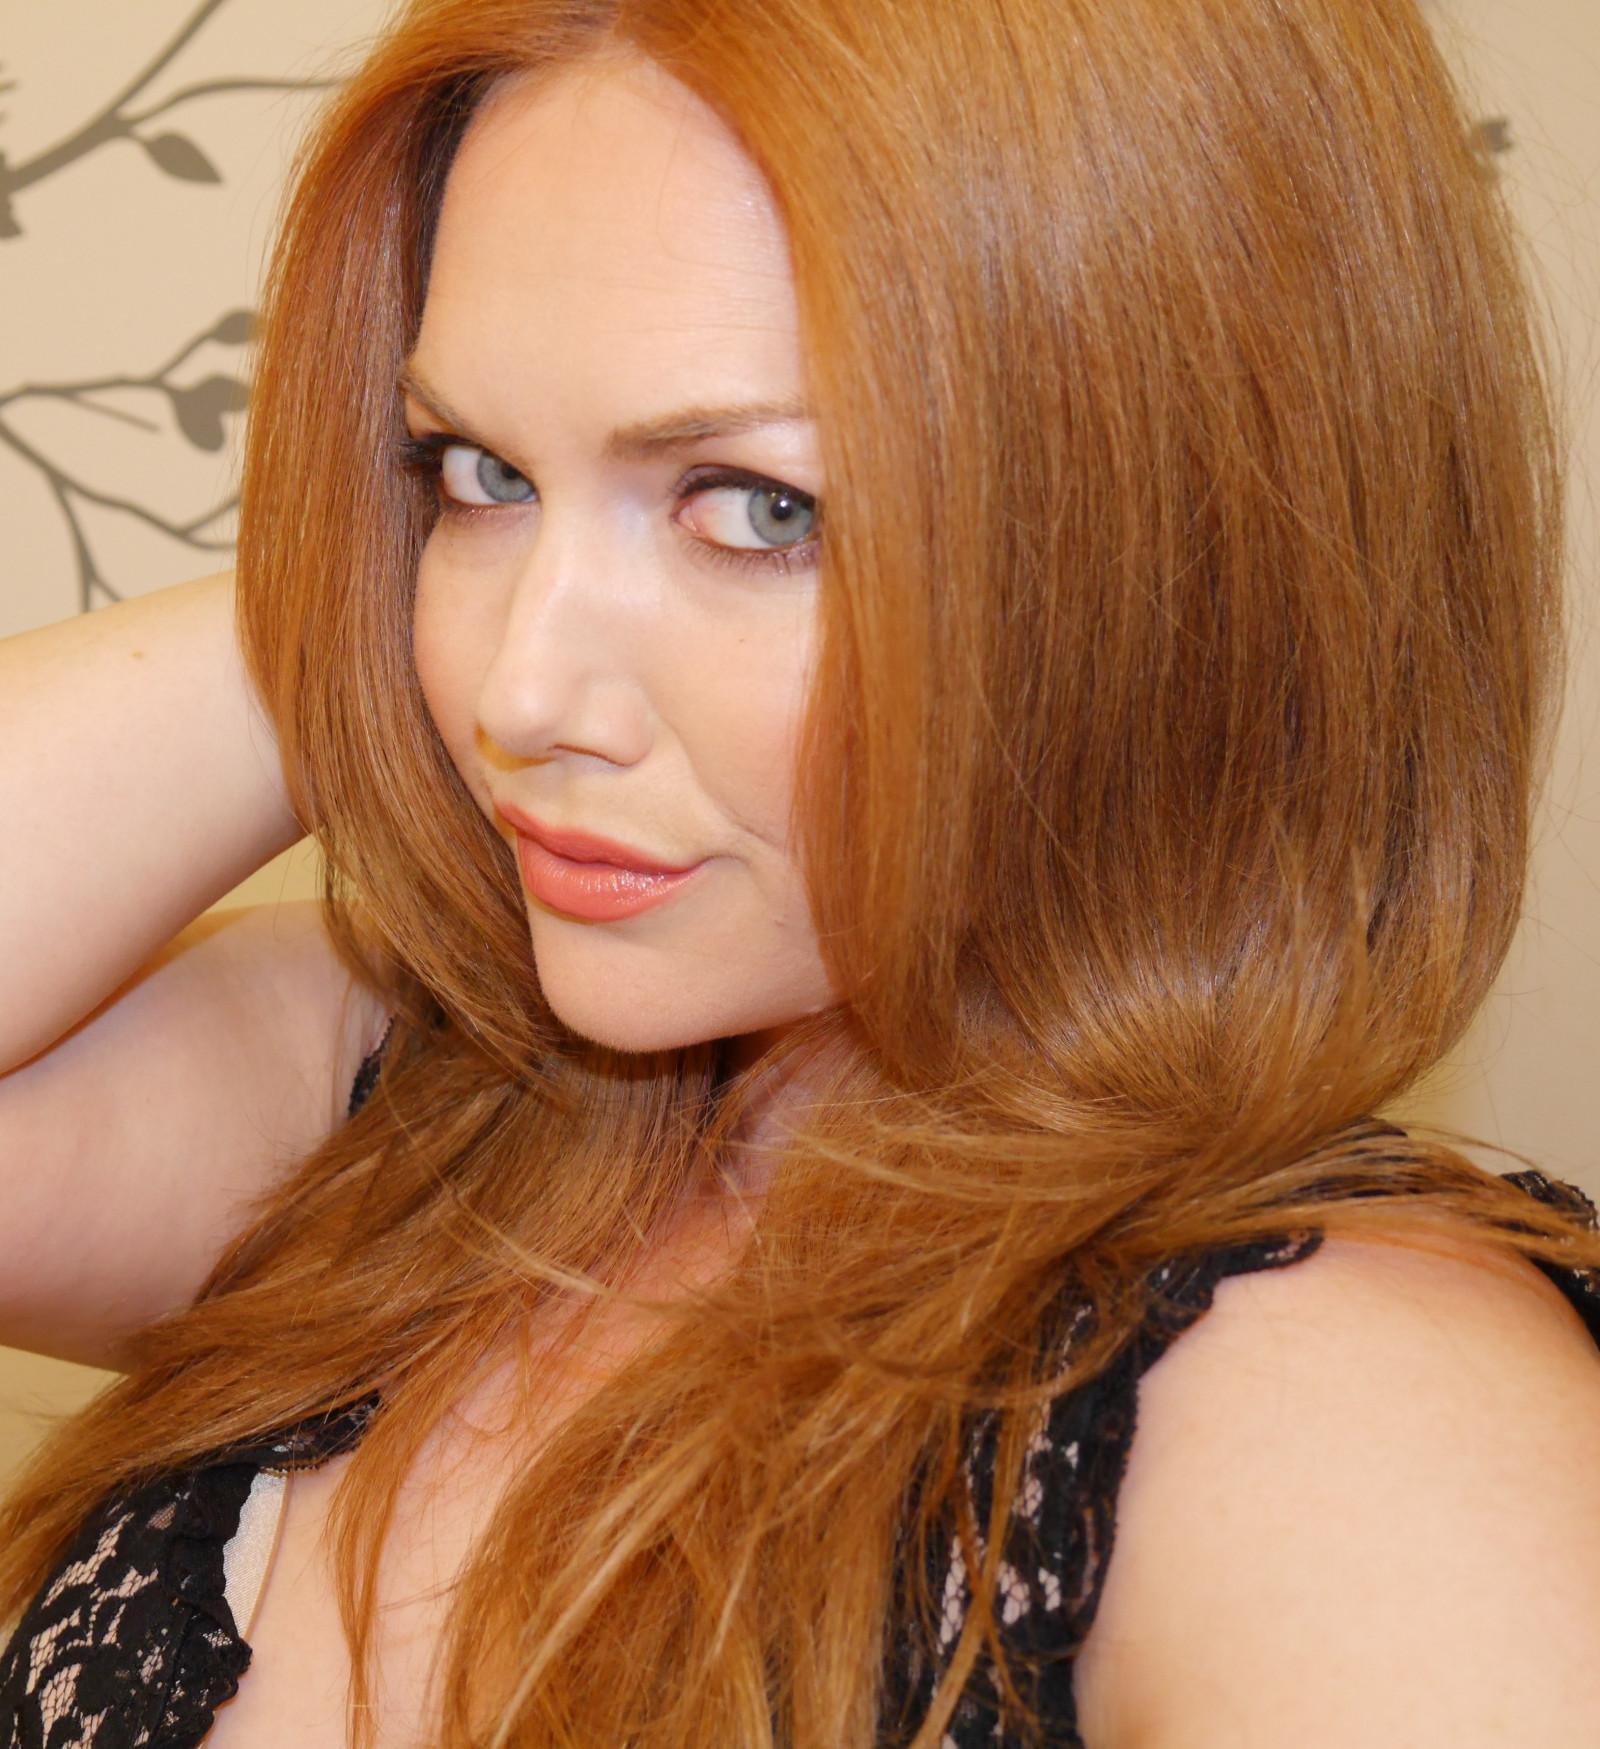 Wallpaper  face, women, redhead, long hair, looking at